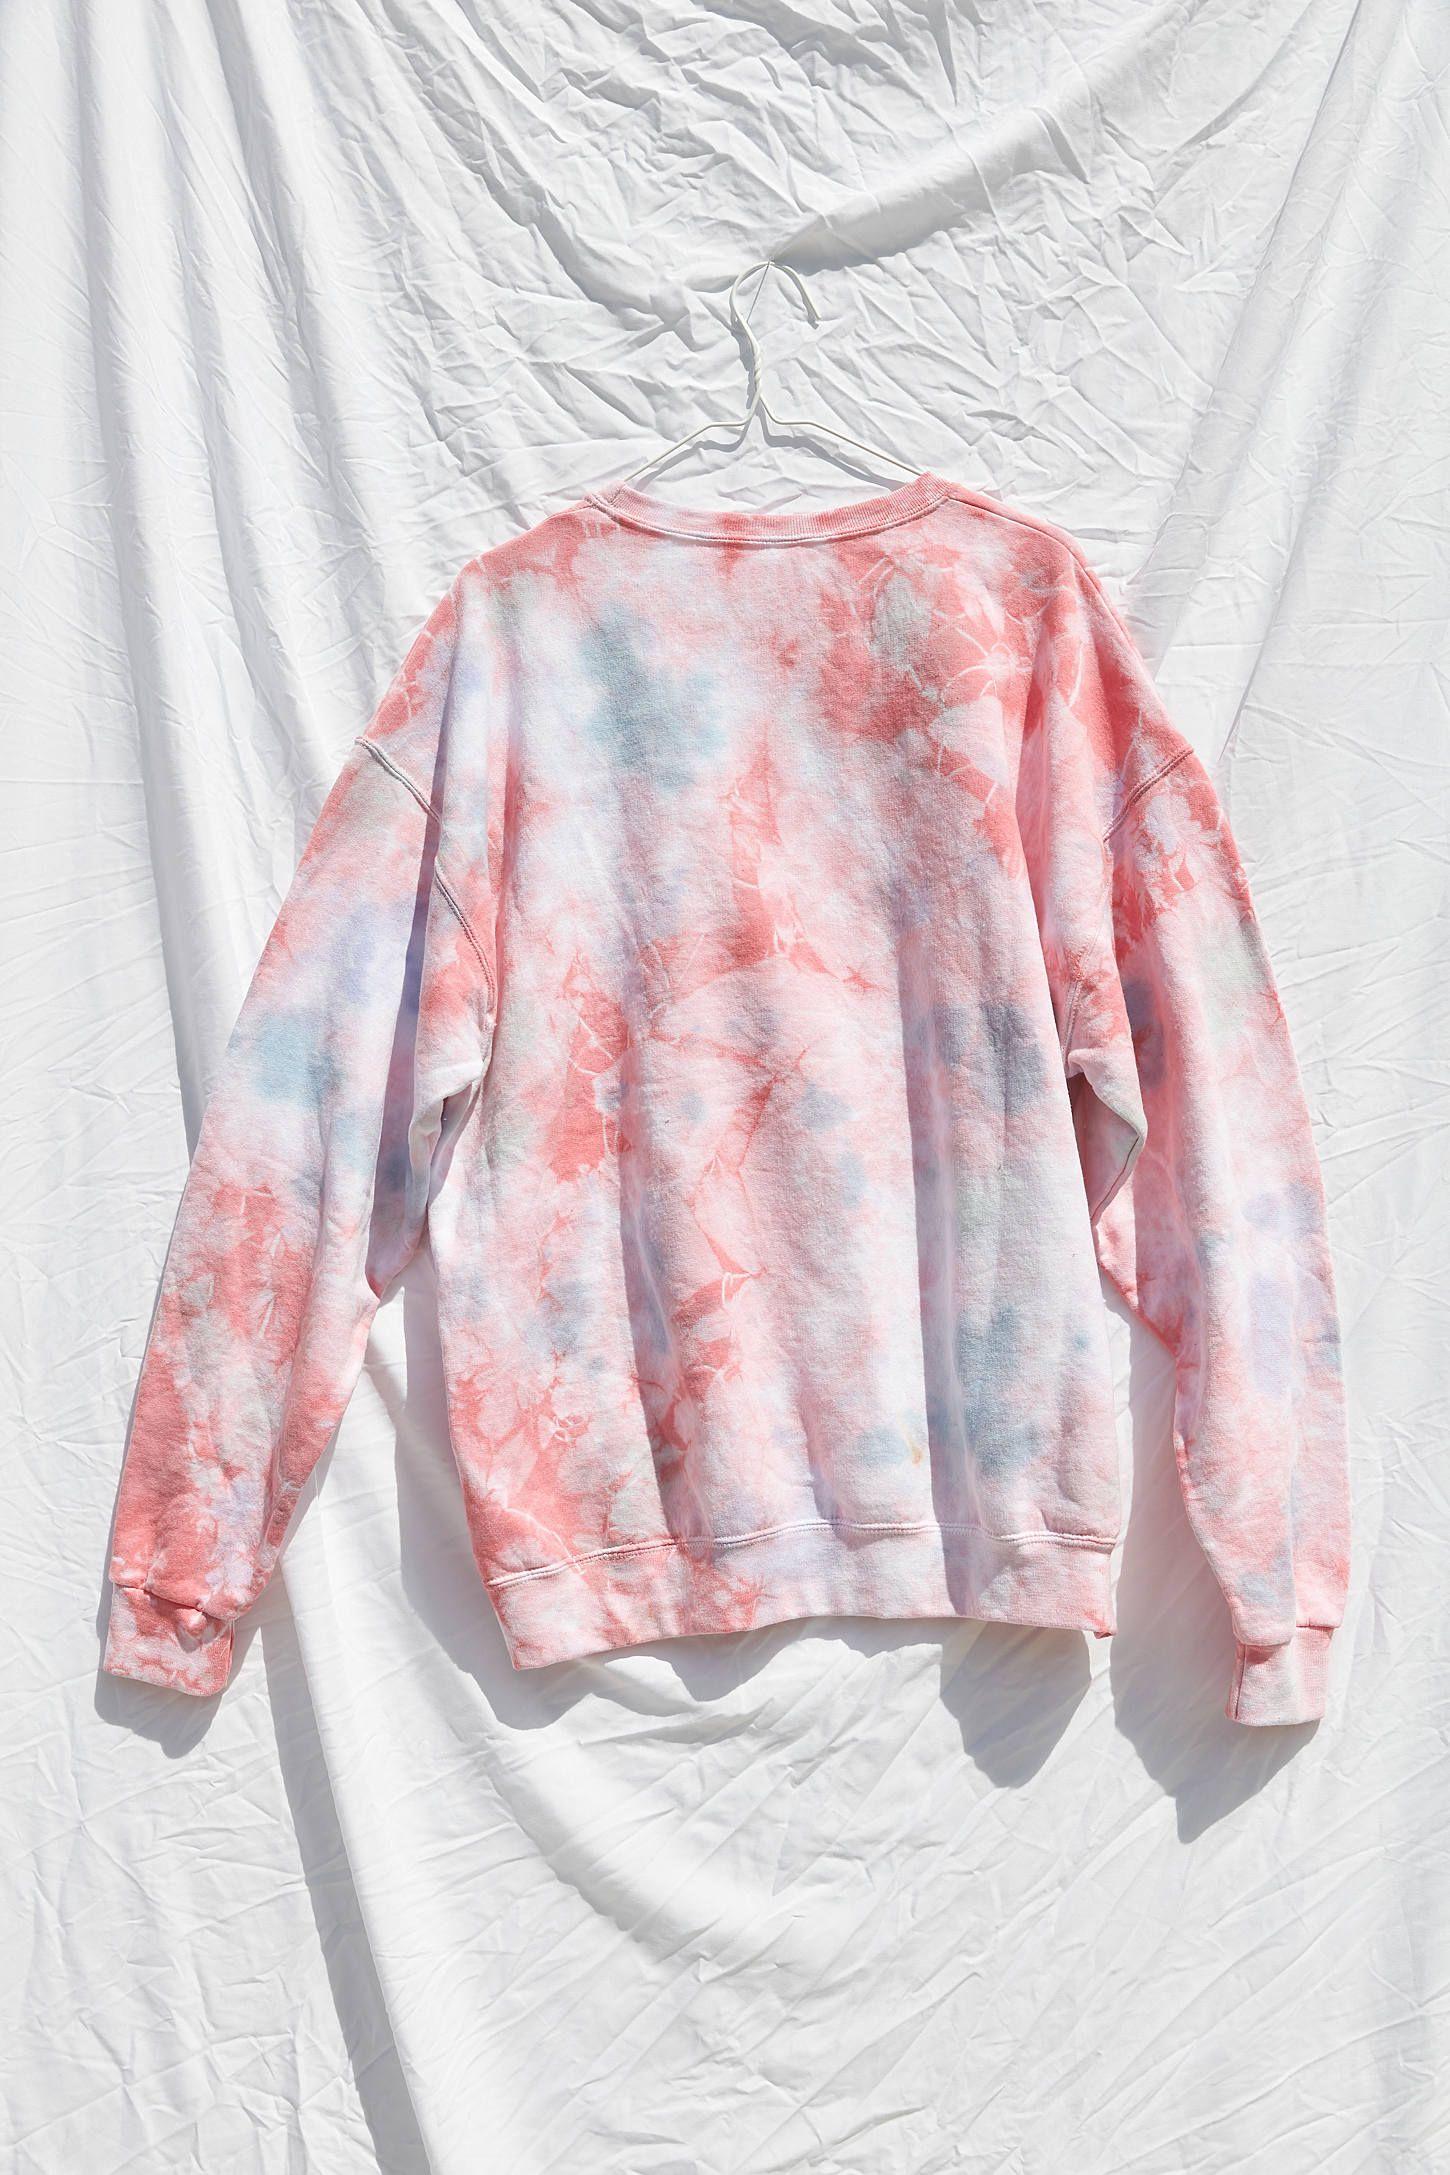 Urban Renewal Recycled Cosmic Tie Dye Crew Neck Sweatshirt Tie Dye Shirts Tie Dye Crew Neck Sweatshirt [ 2175 x 1450 Pixel ]